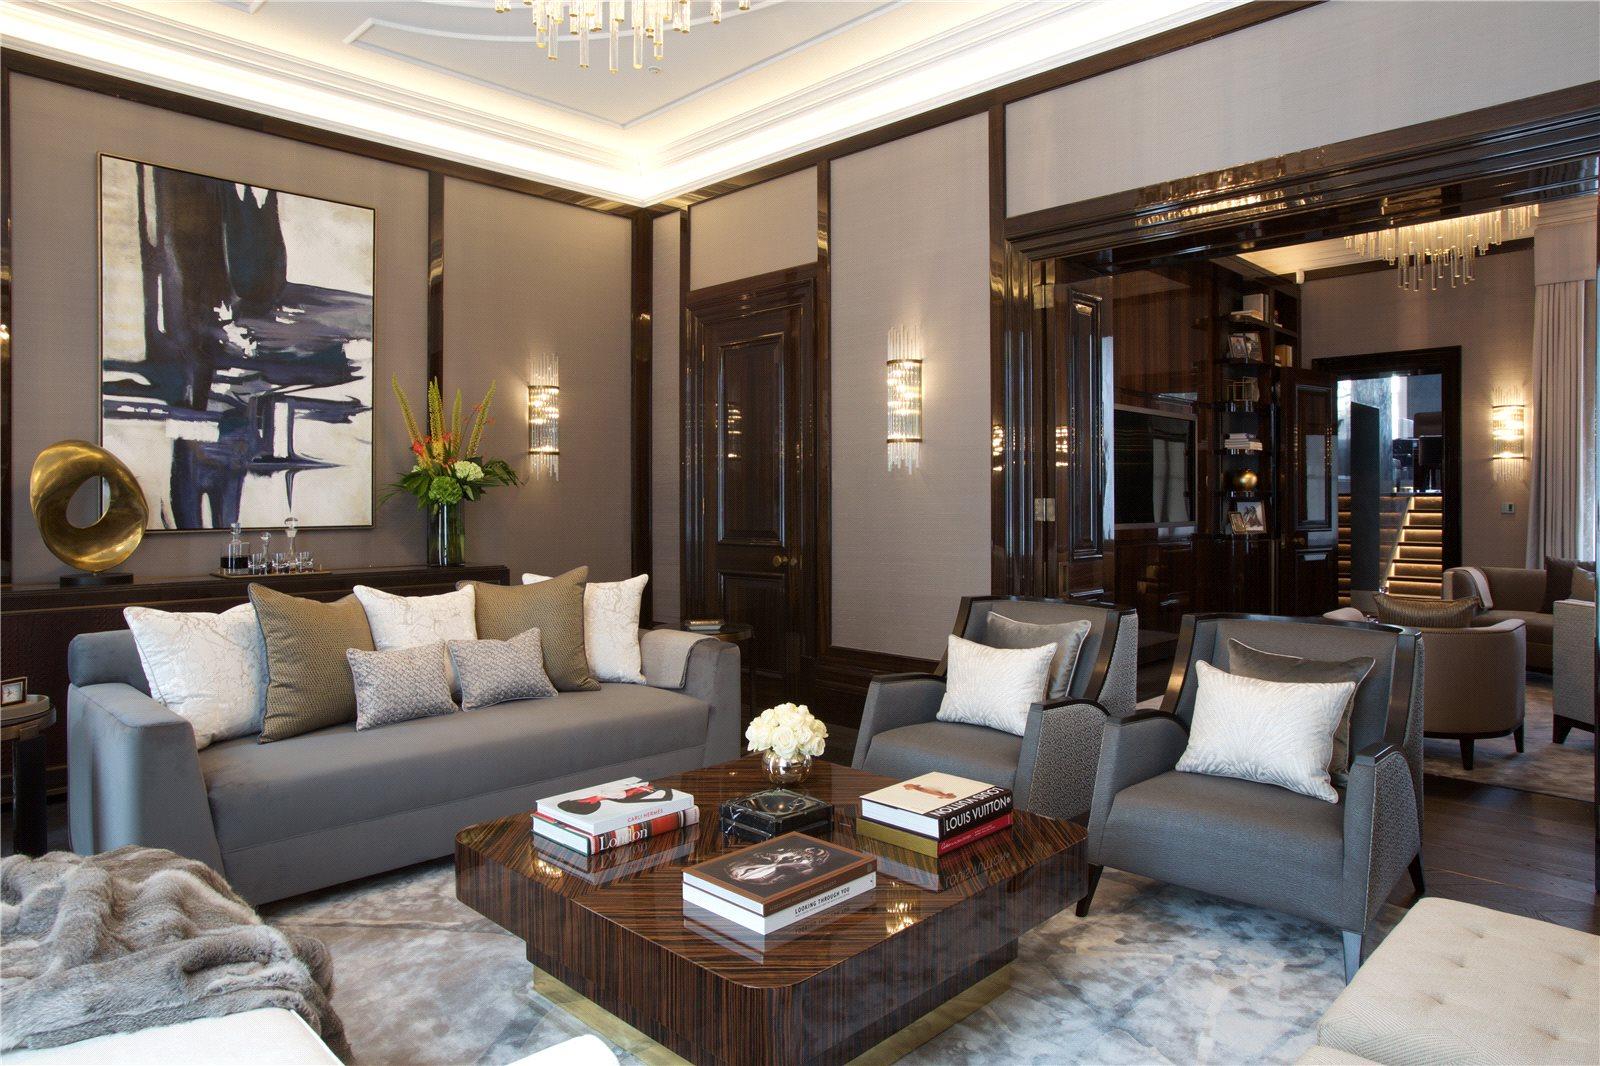 Single Family Home For Rent At Cadogan Place, Belgravia, London, SW1X  Belgravia,